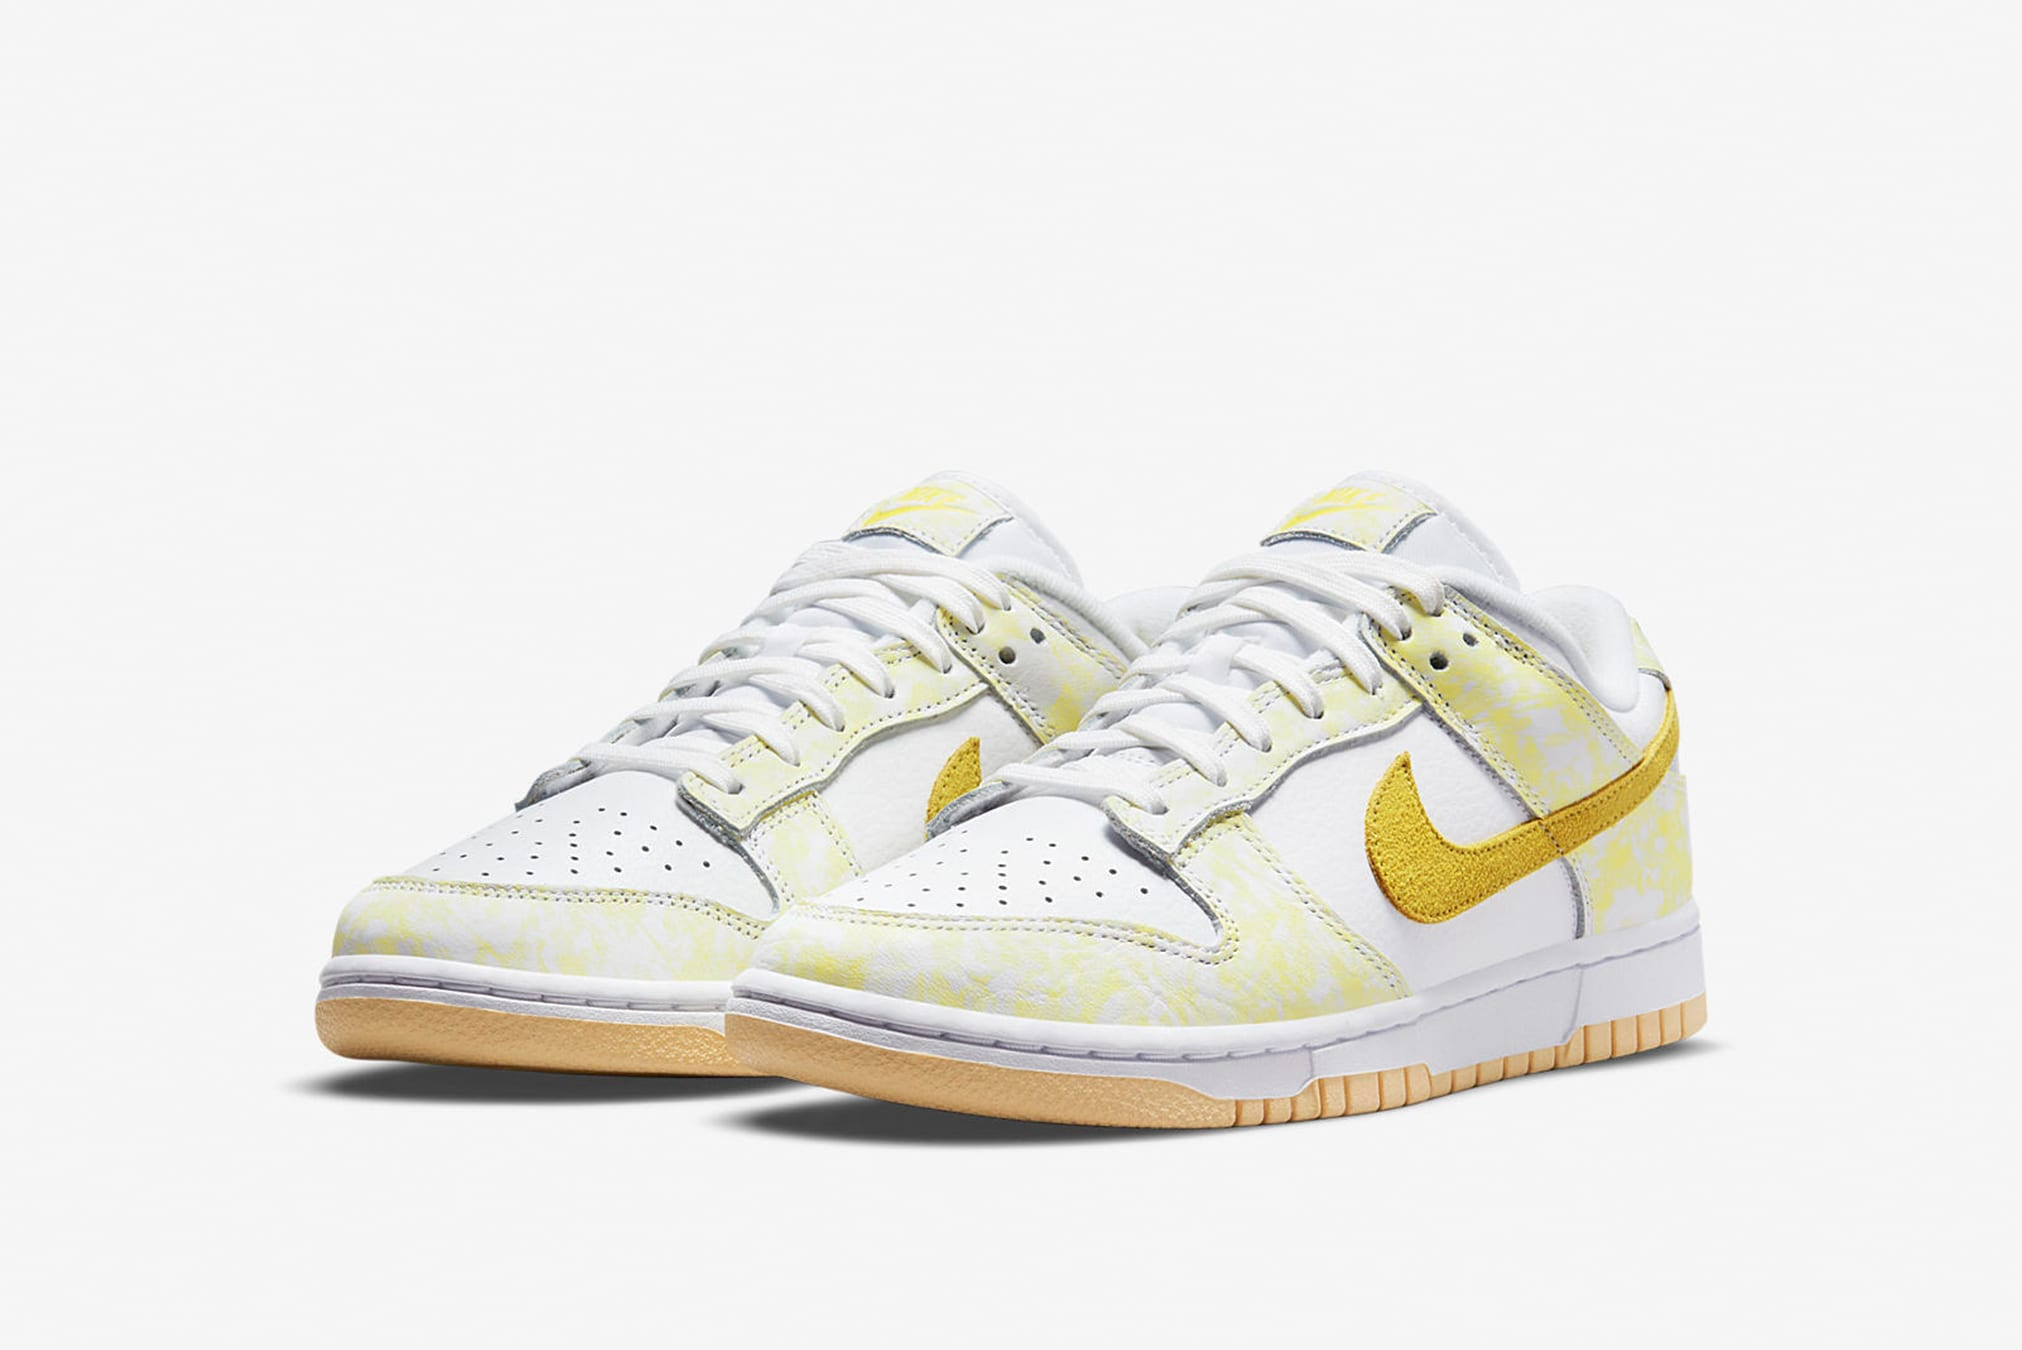 Nike Dunk Low OG W - DM9467-700